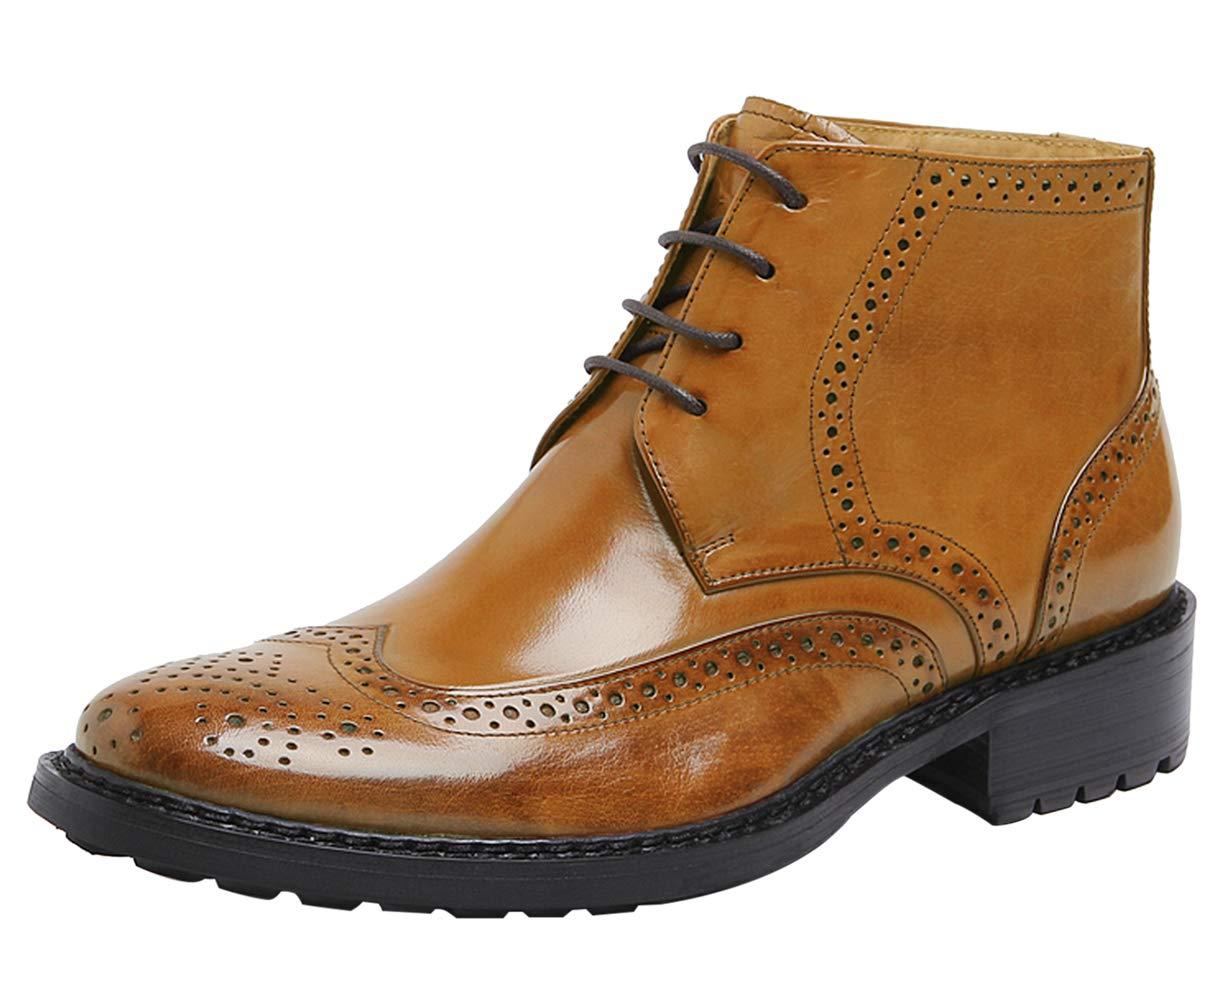 SANTIMON Men's Heritage Wingtip Boots Leather Lace up Brogue Oxford Ankle Boot Tan 7.5 D(M) US by SANTIMON